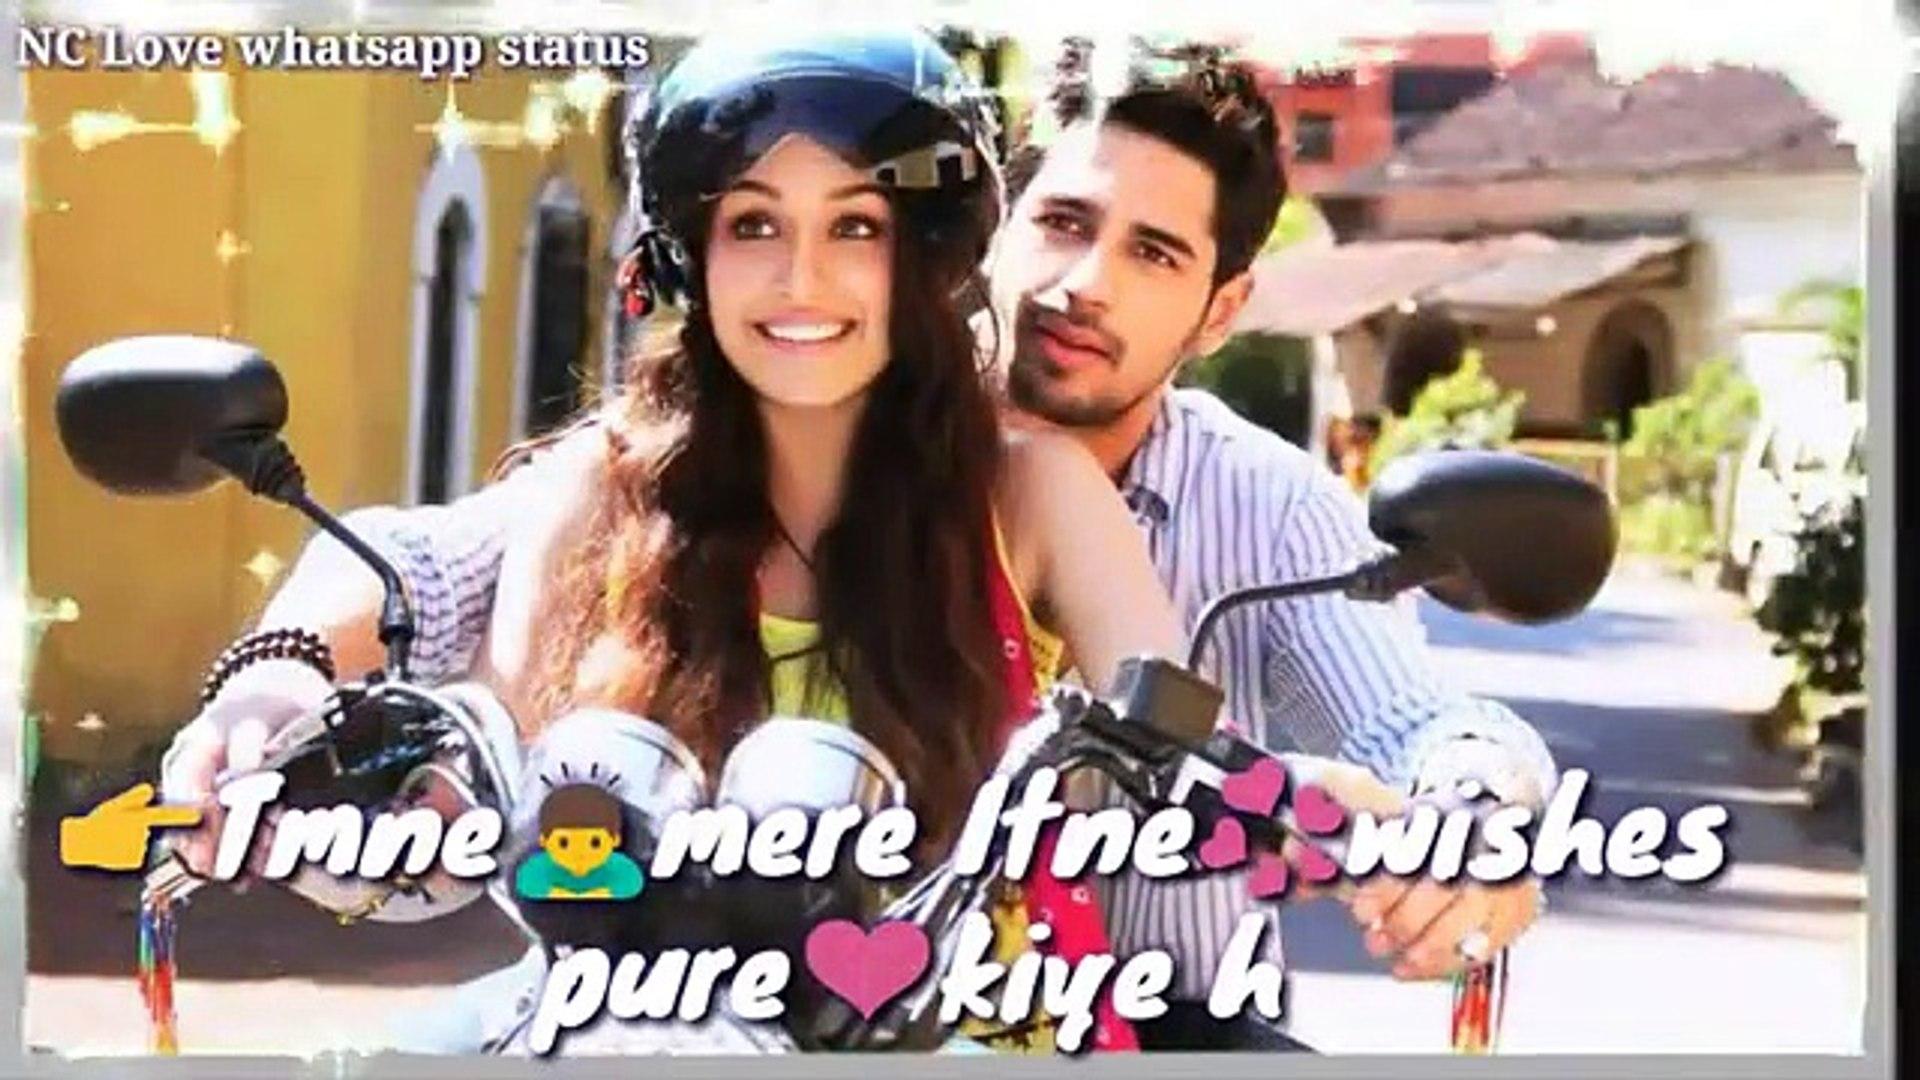 Best whatsappstatus for shraddha kapoor fansNC Love whatsapp status